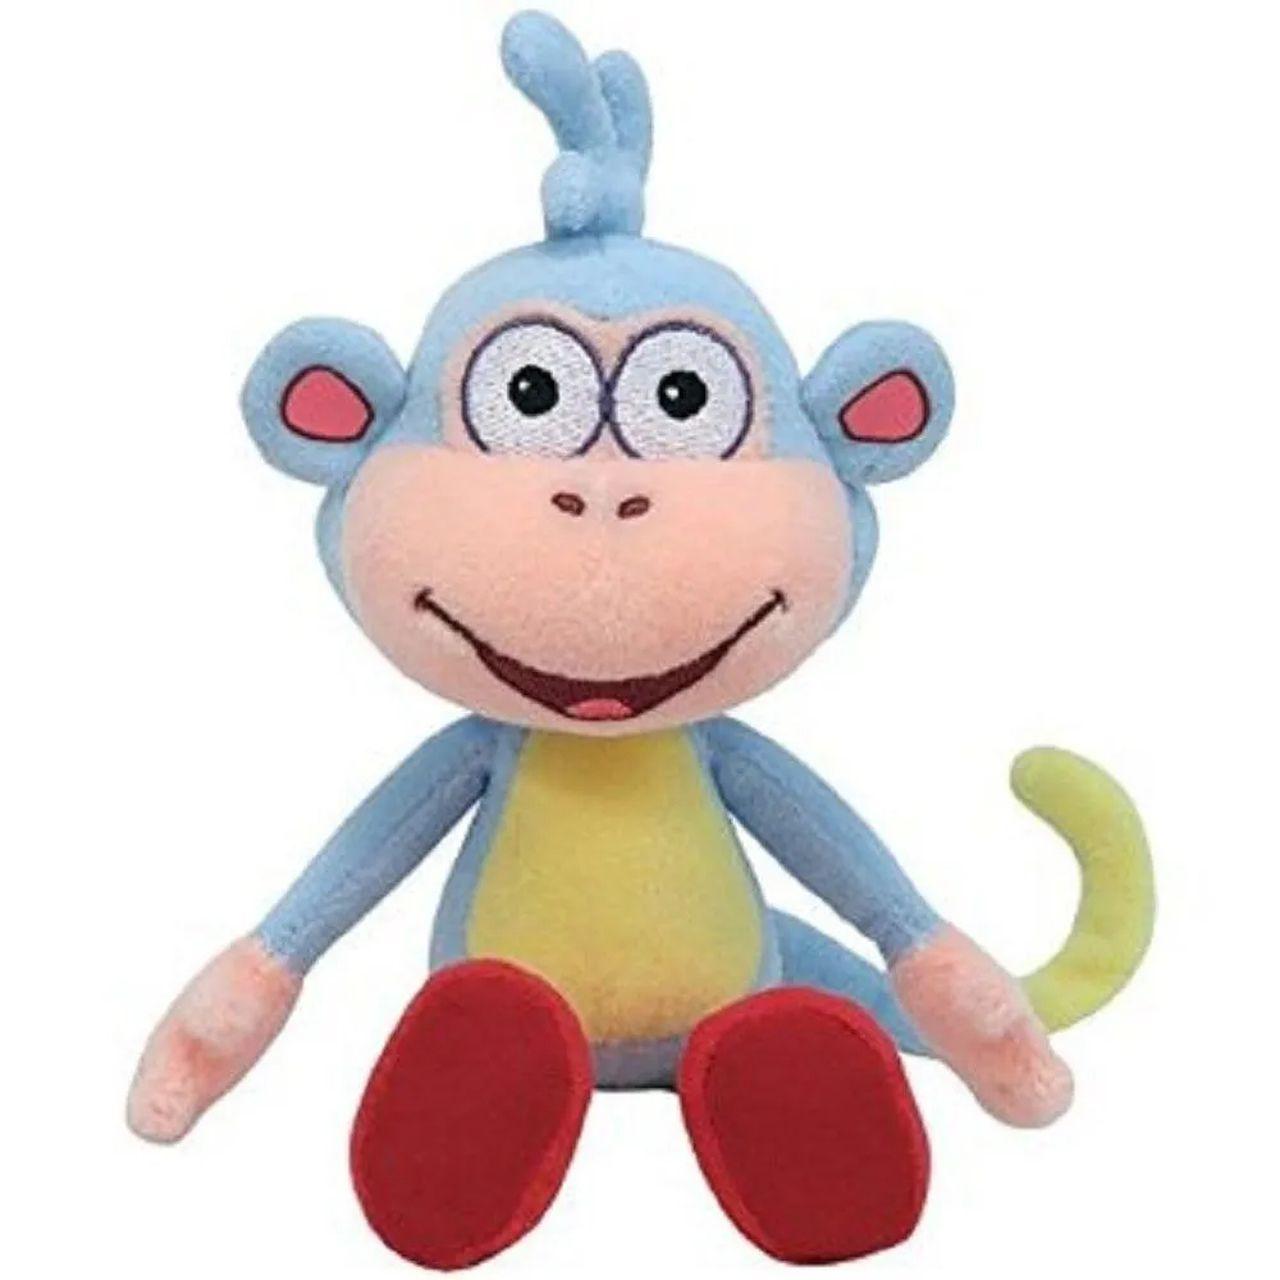 Ty Beanie Babies - Pelucia Dora Aventureira - Macaco Botas